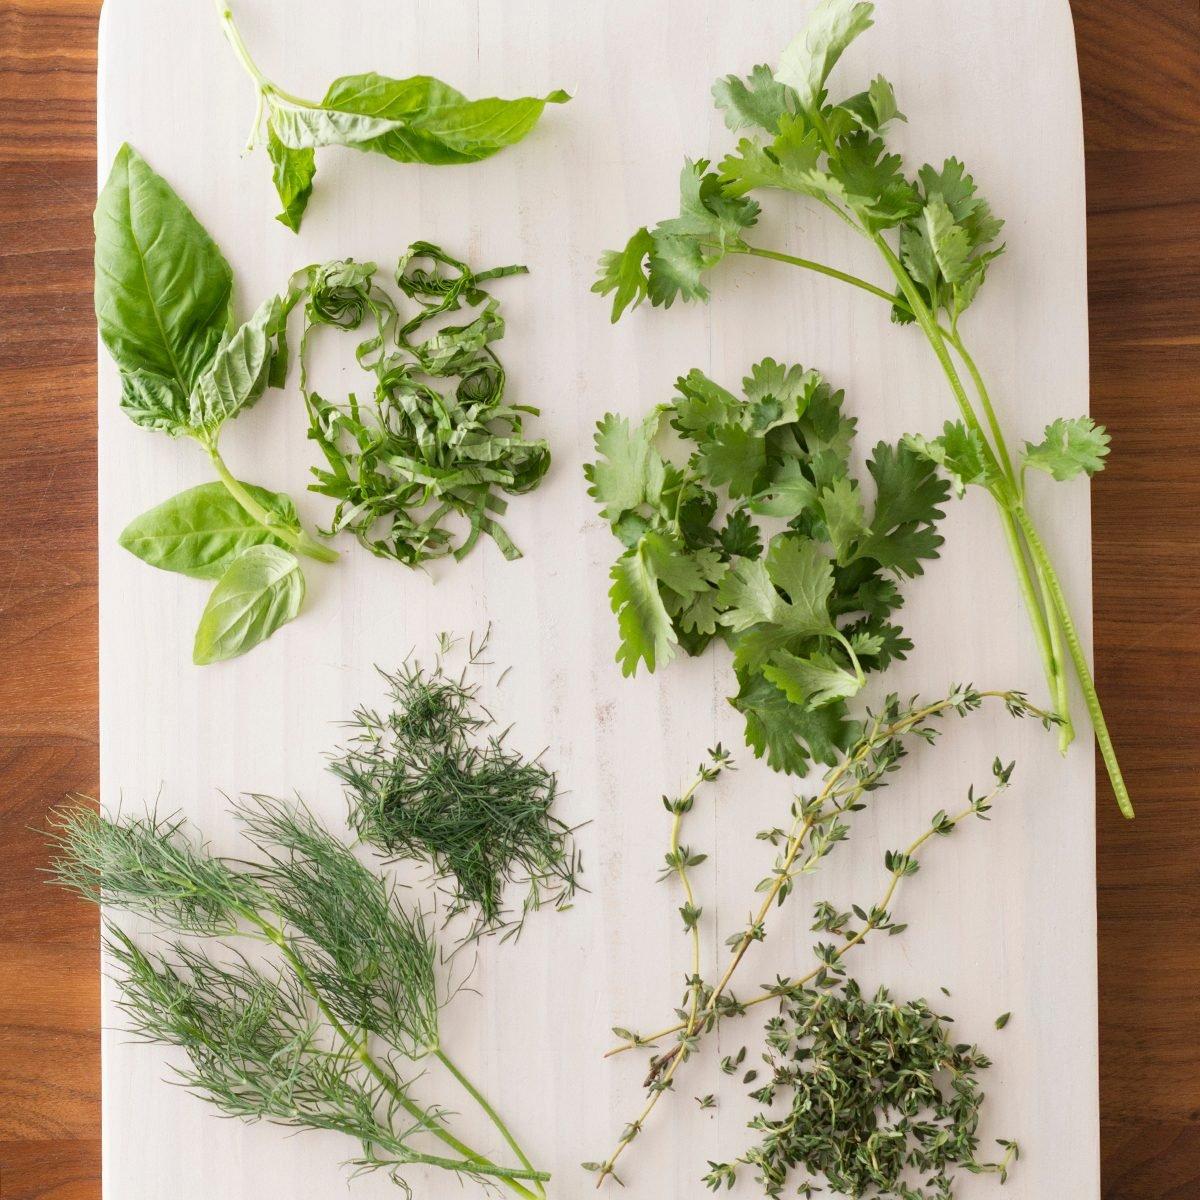 Snip, Chop and Chiffonade: How to Prep Fresh Herbs